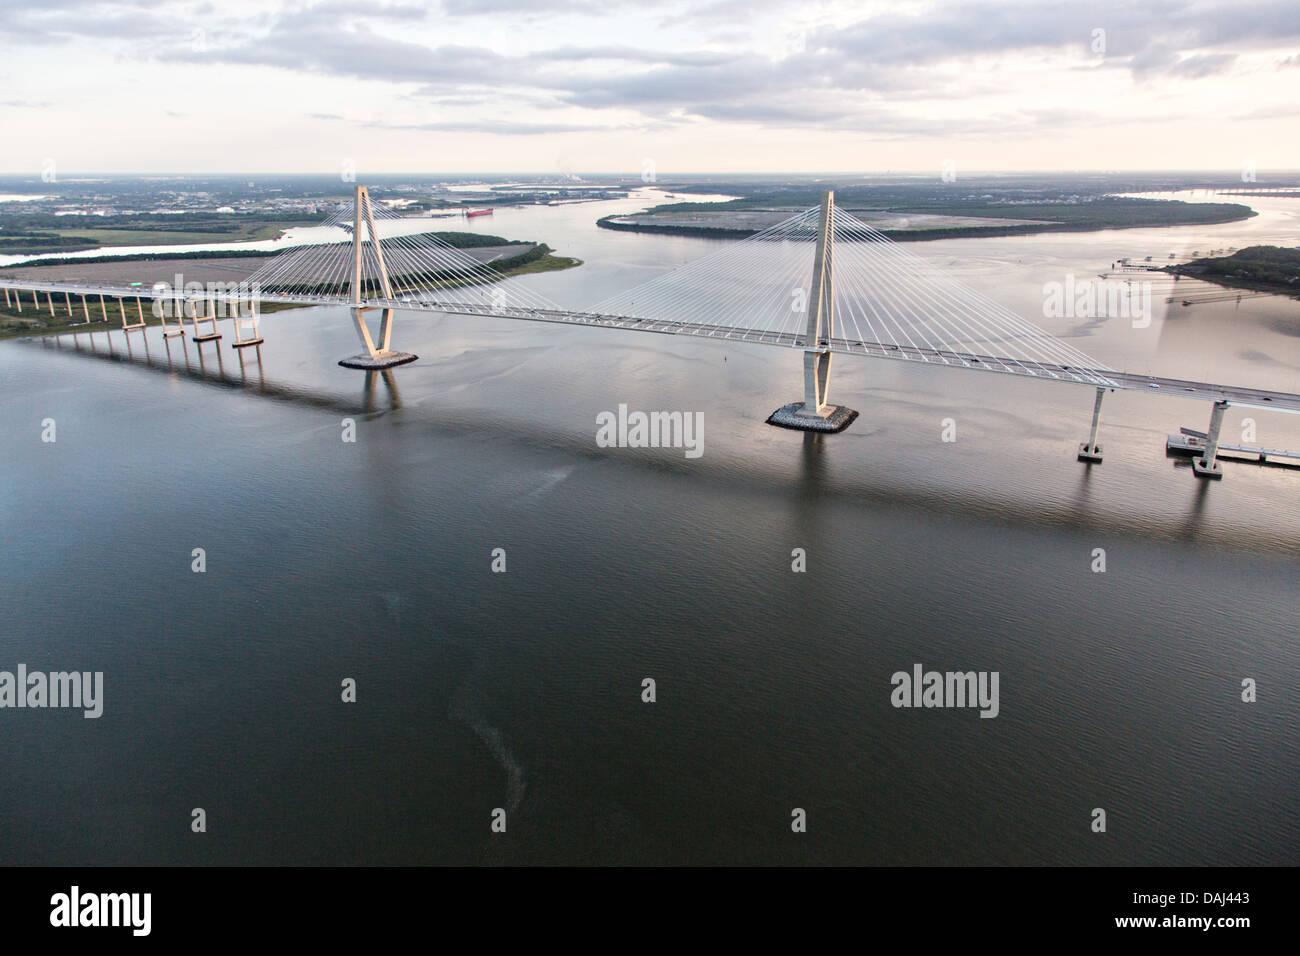 Aerial view of the Arthur Ravenel Bridge in Charleston, SC. - Stock Image